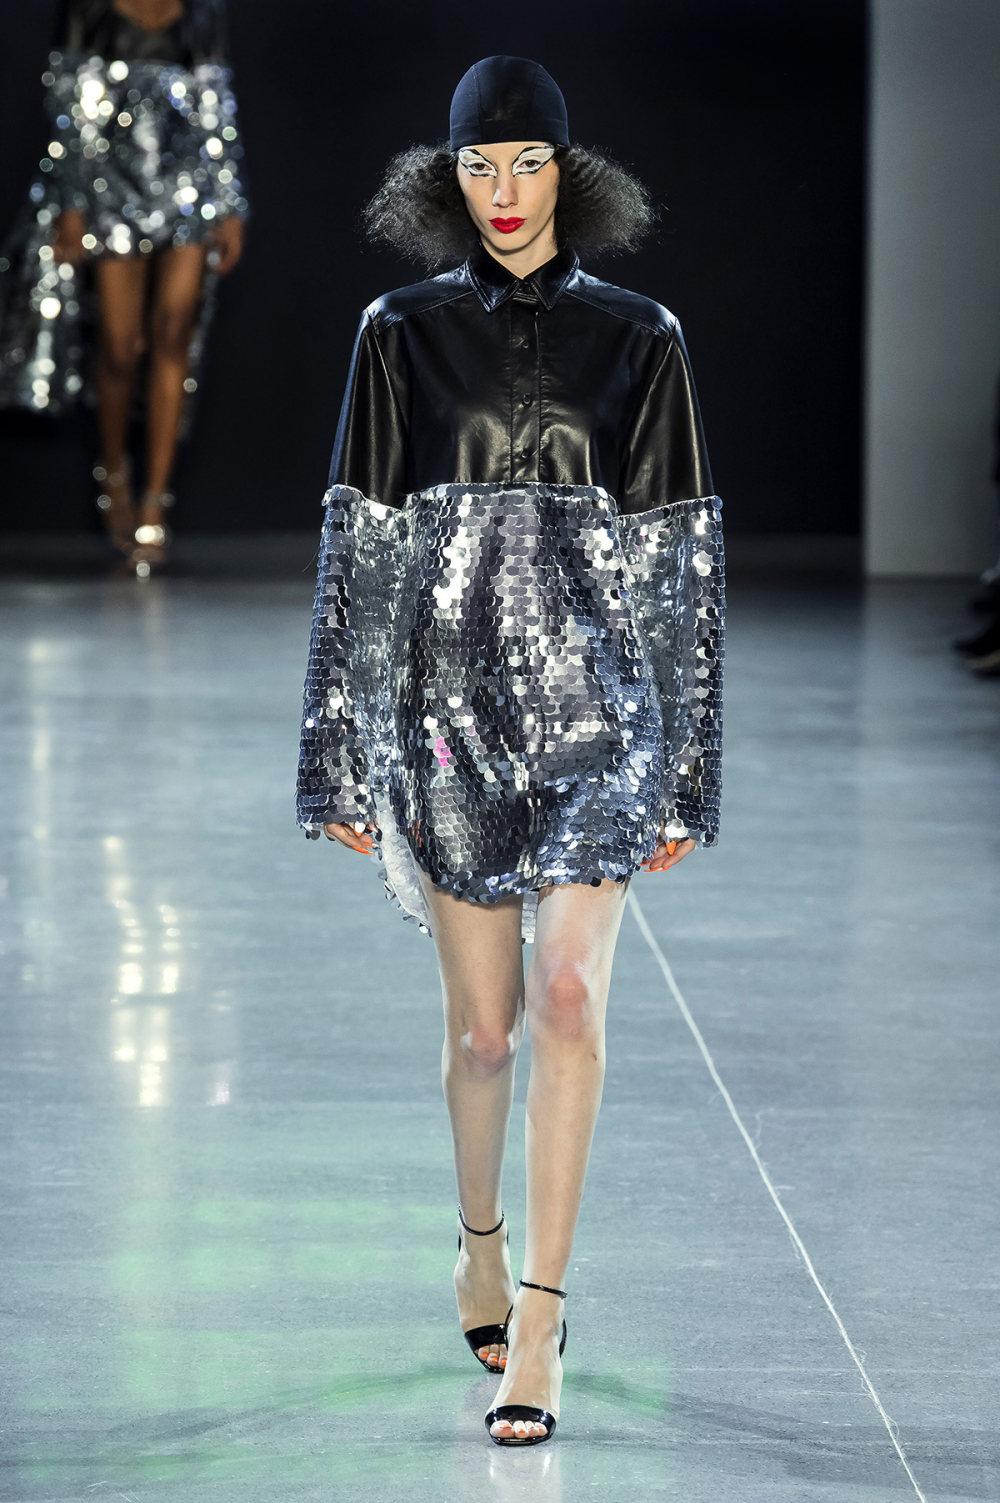 Christian Cowan时装系列虽然巨大的薄纱层状服装并没有那么特别-26.jpg